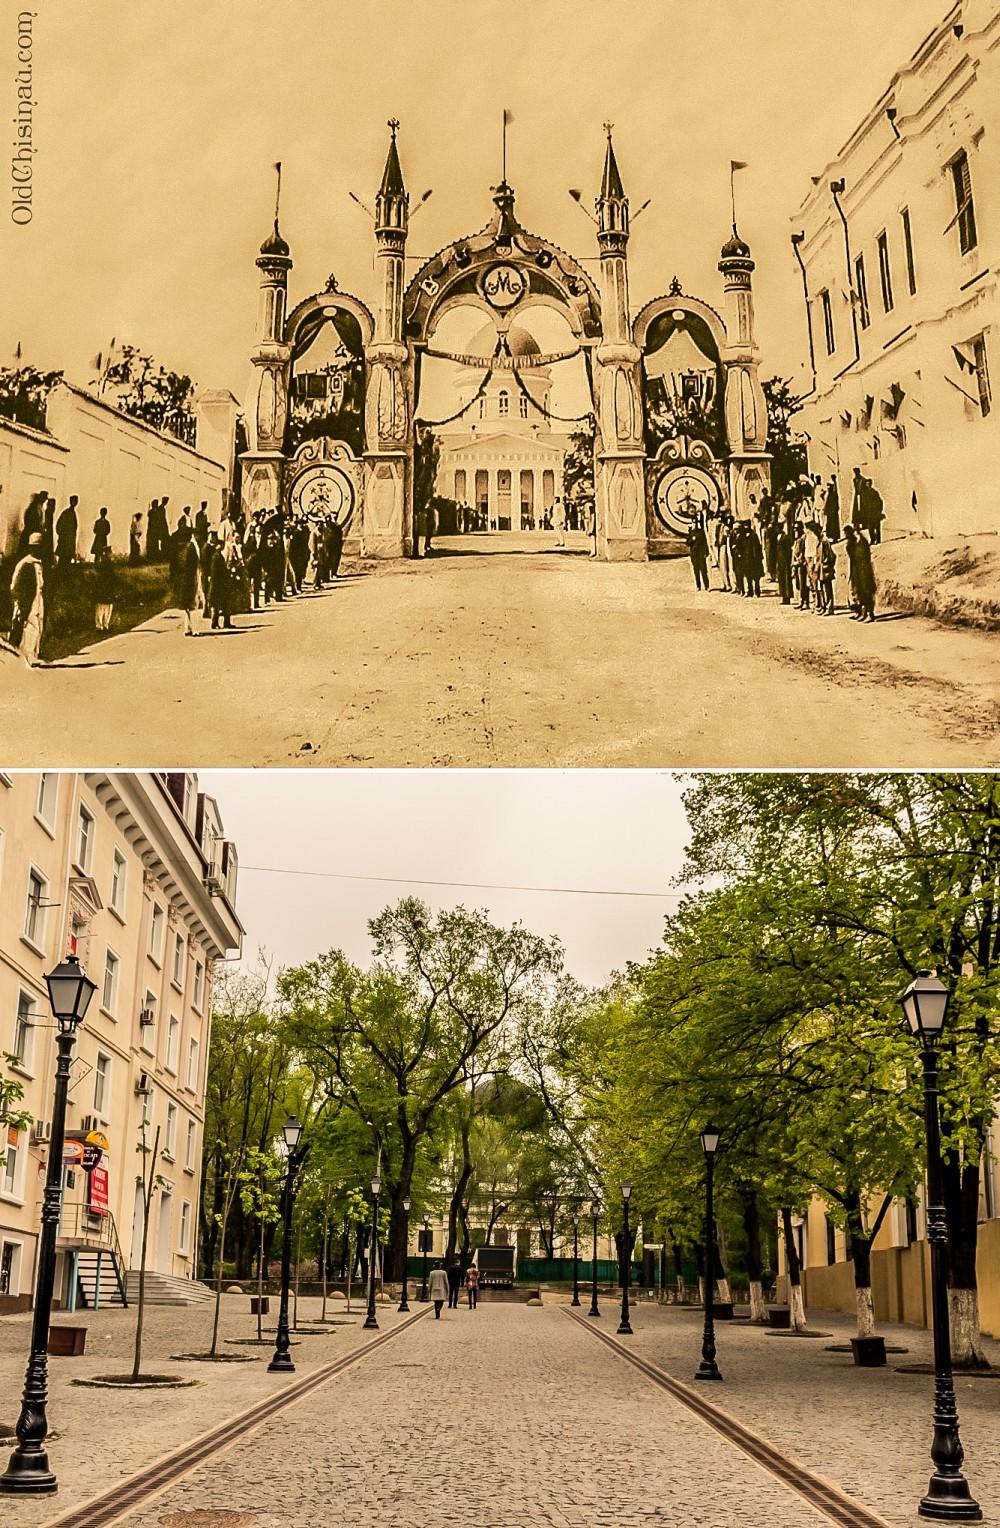 Третья арка (у дома Катаржи).